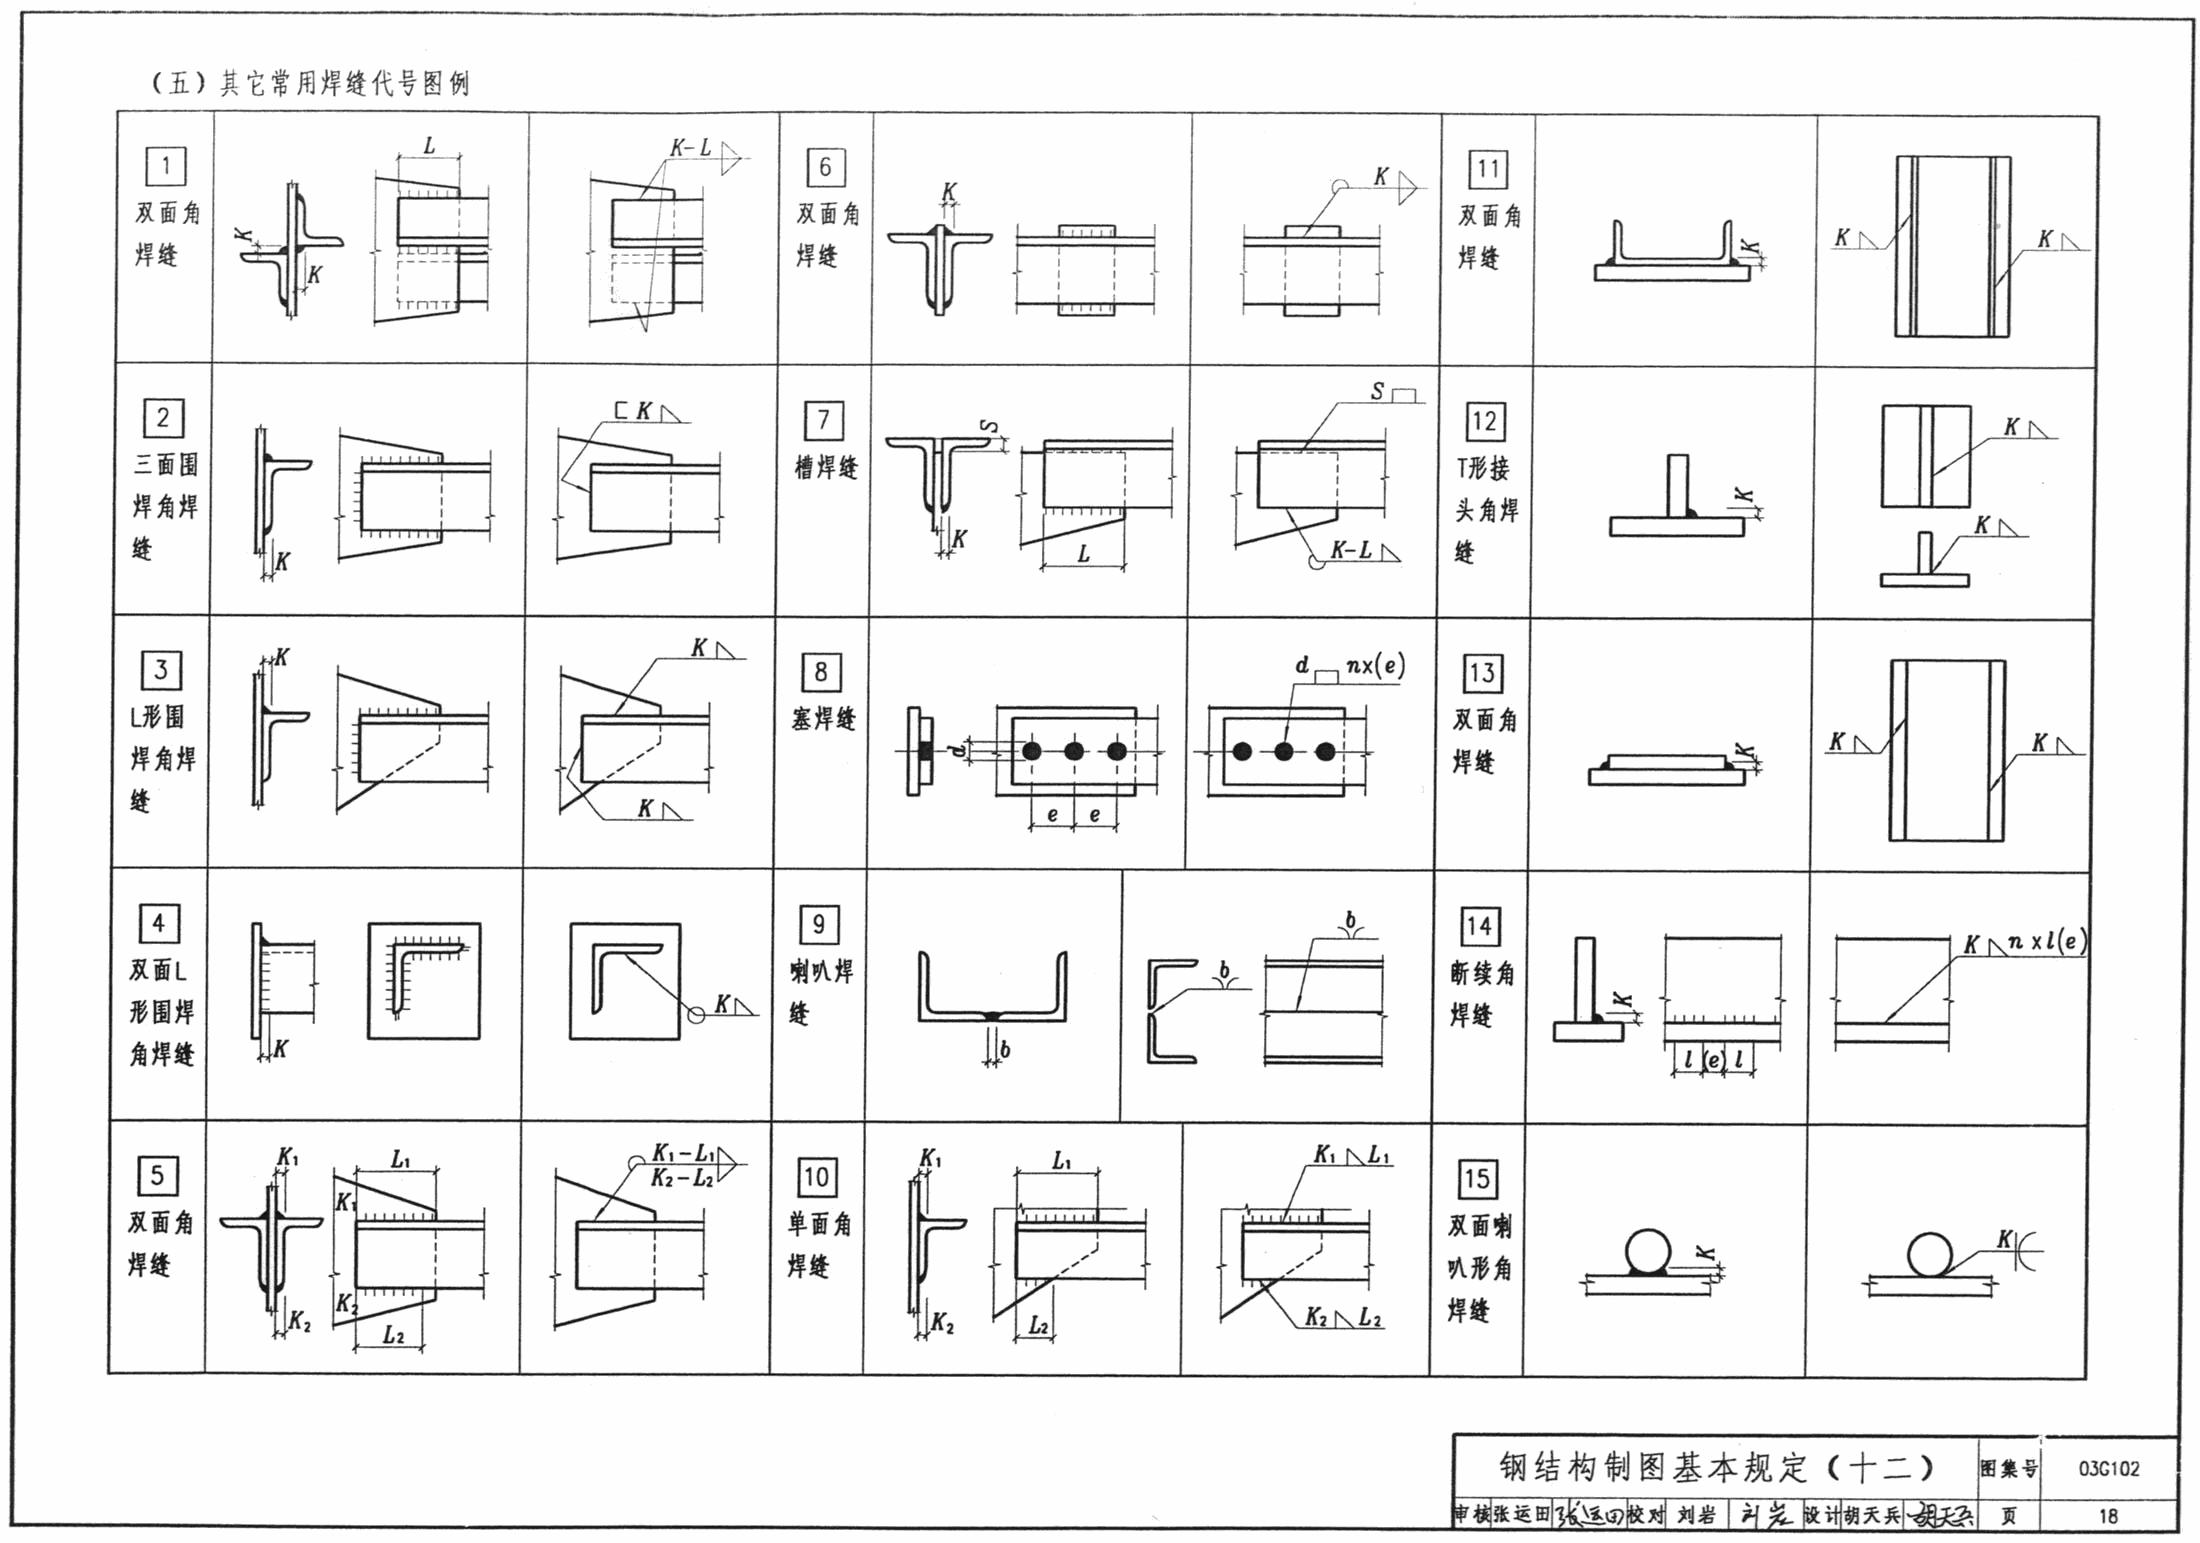 03g102:钢结构设计制图深度和表示方法